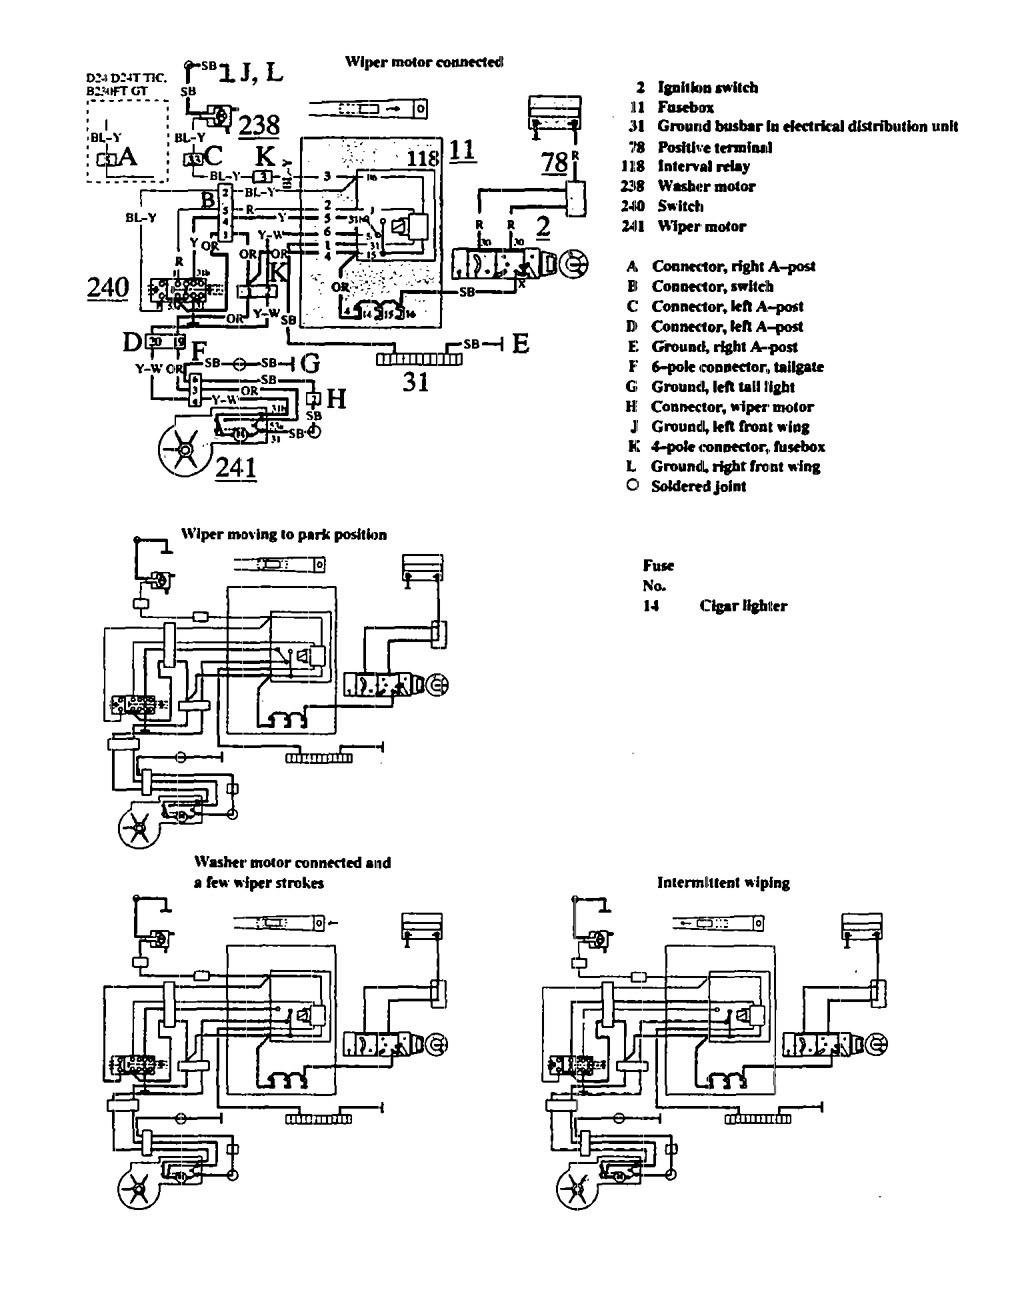 1995 Volvo 940 Wiring Diagram Schematics Semi Truck Internal Diagrams Pontiac Firebird